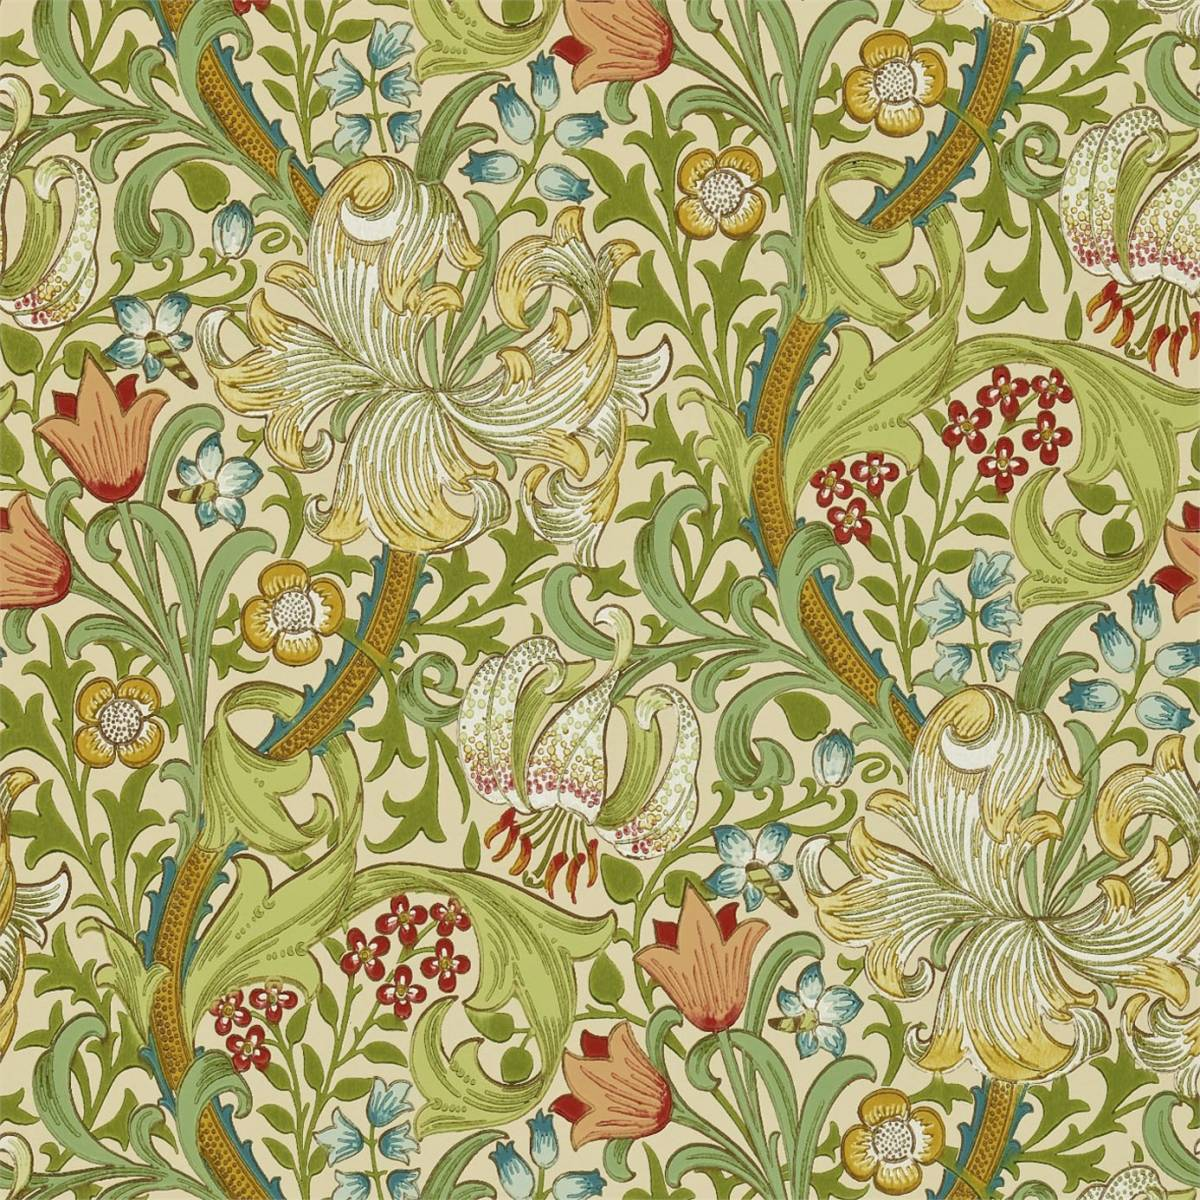 William Morris Wallpaper: Pale Biscuit (210431)